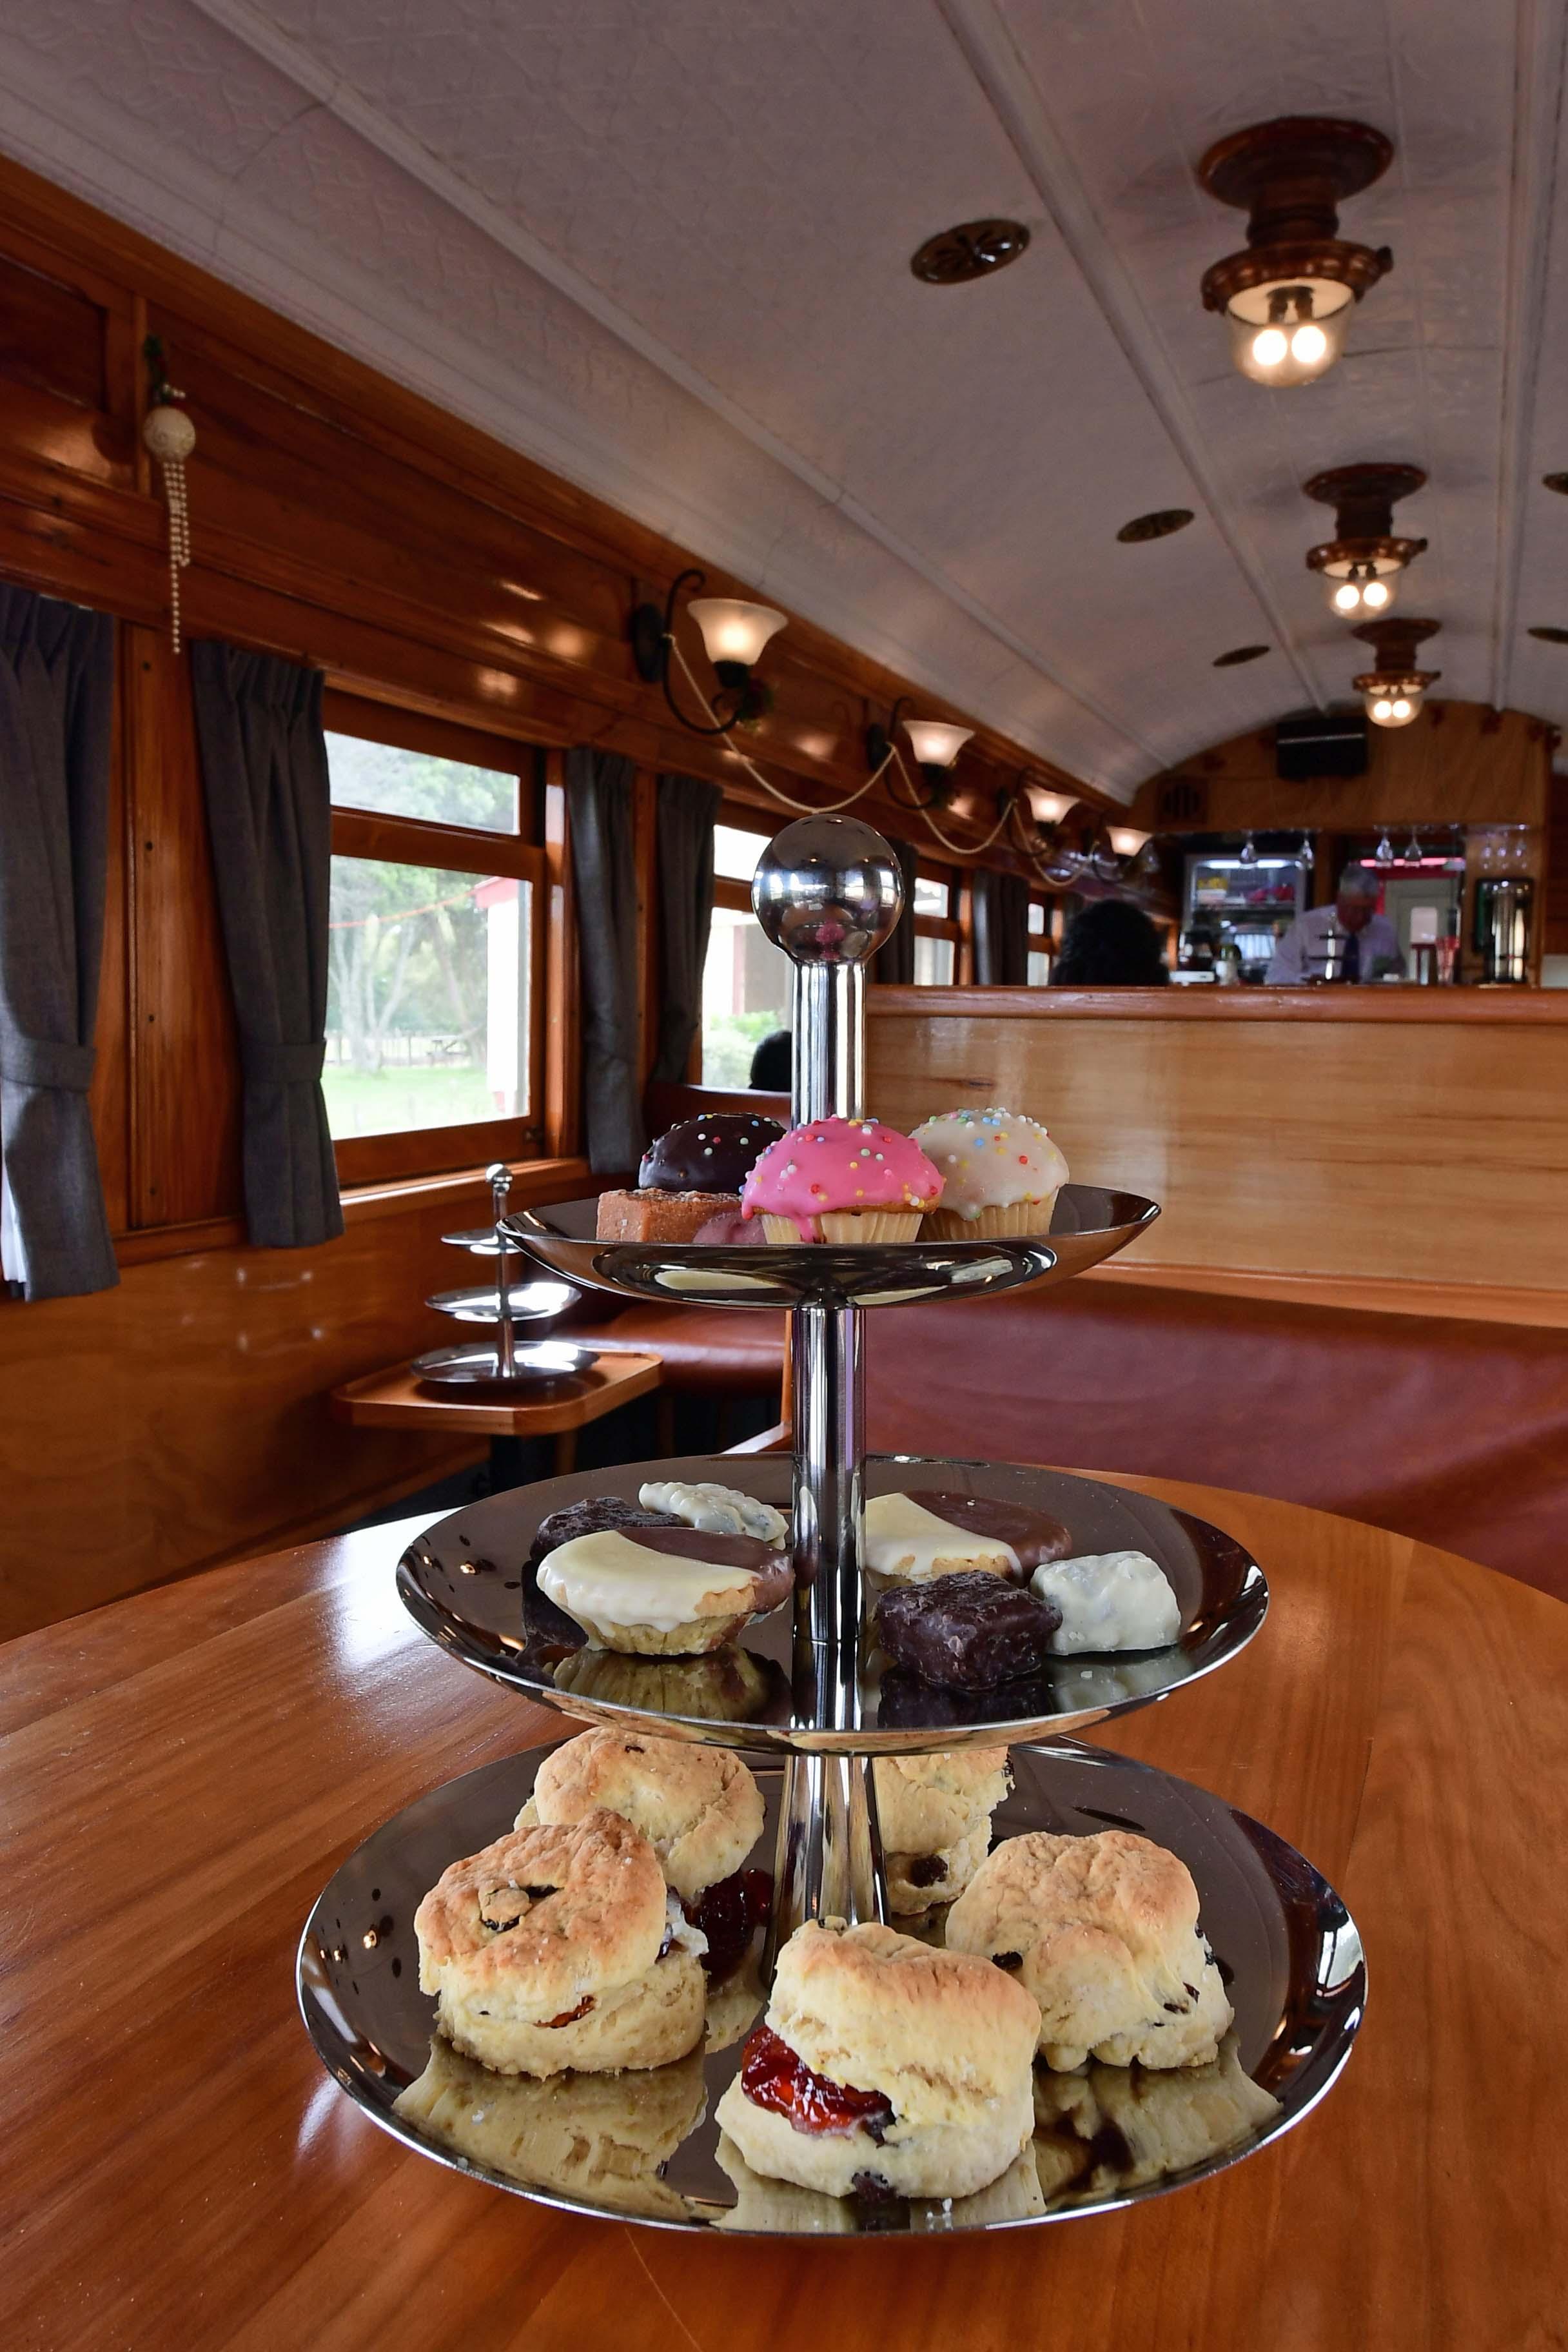 dg318242. parlour car. glenbrook vintage railway. north island. new zealand. 27.1.19crop